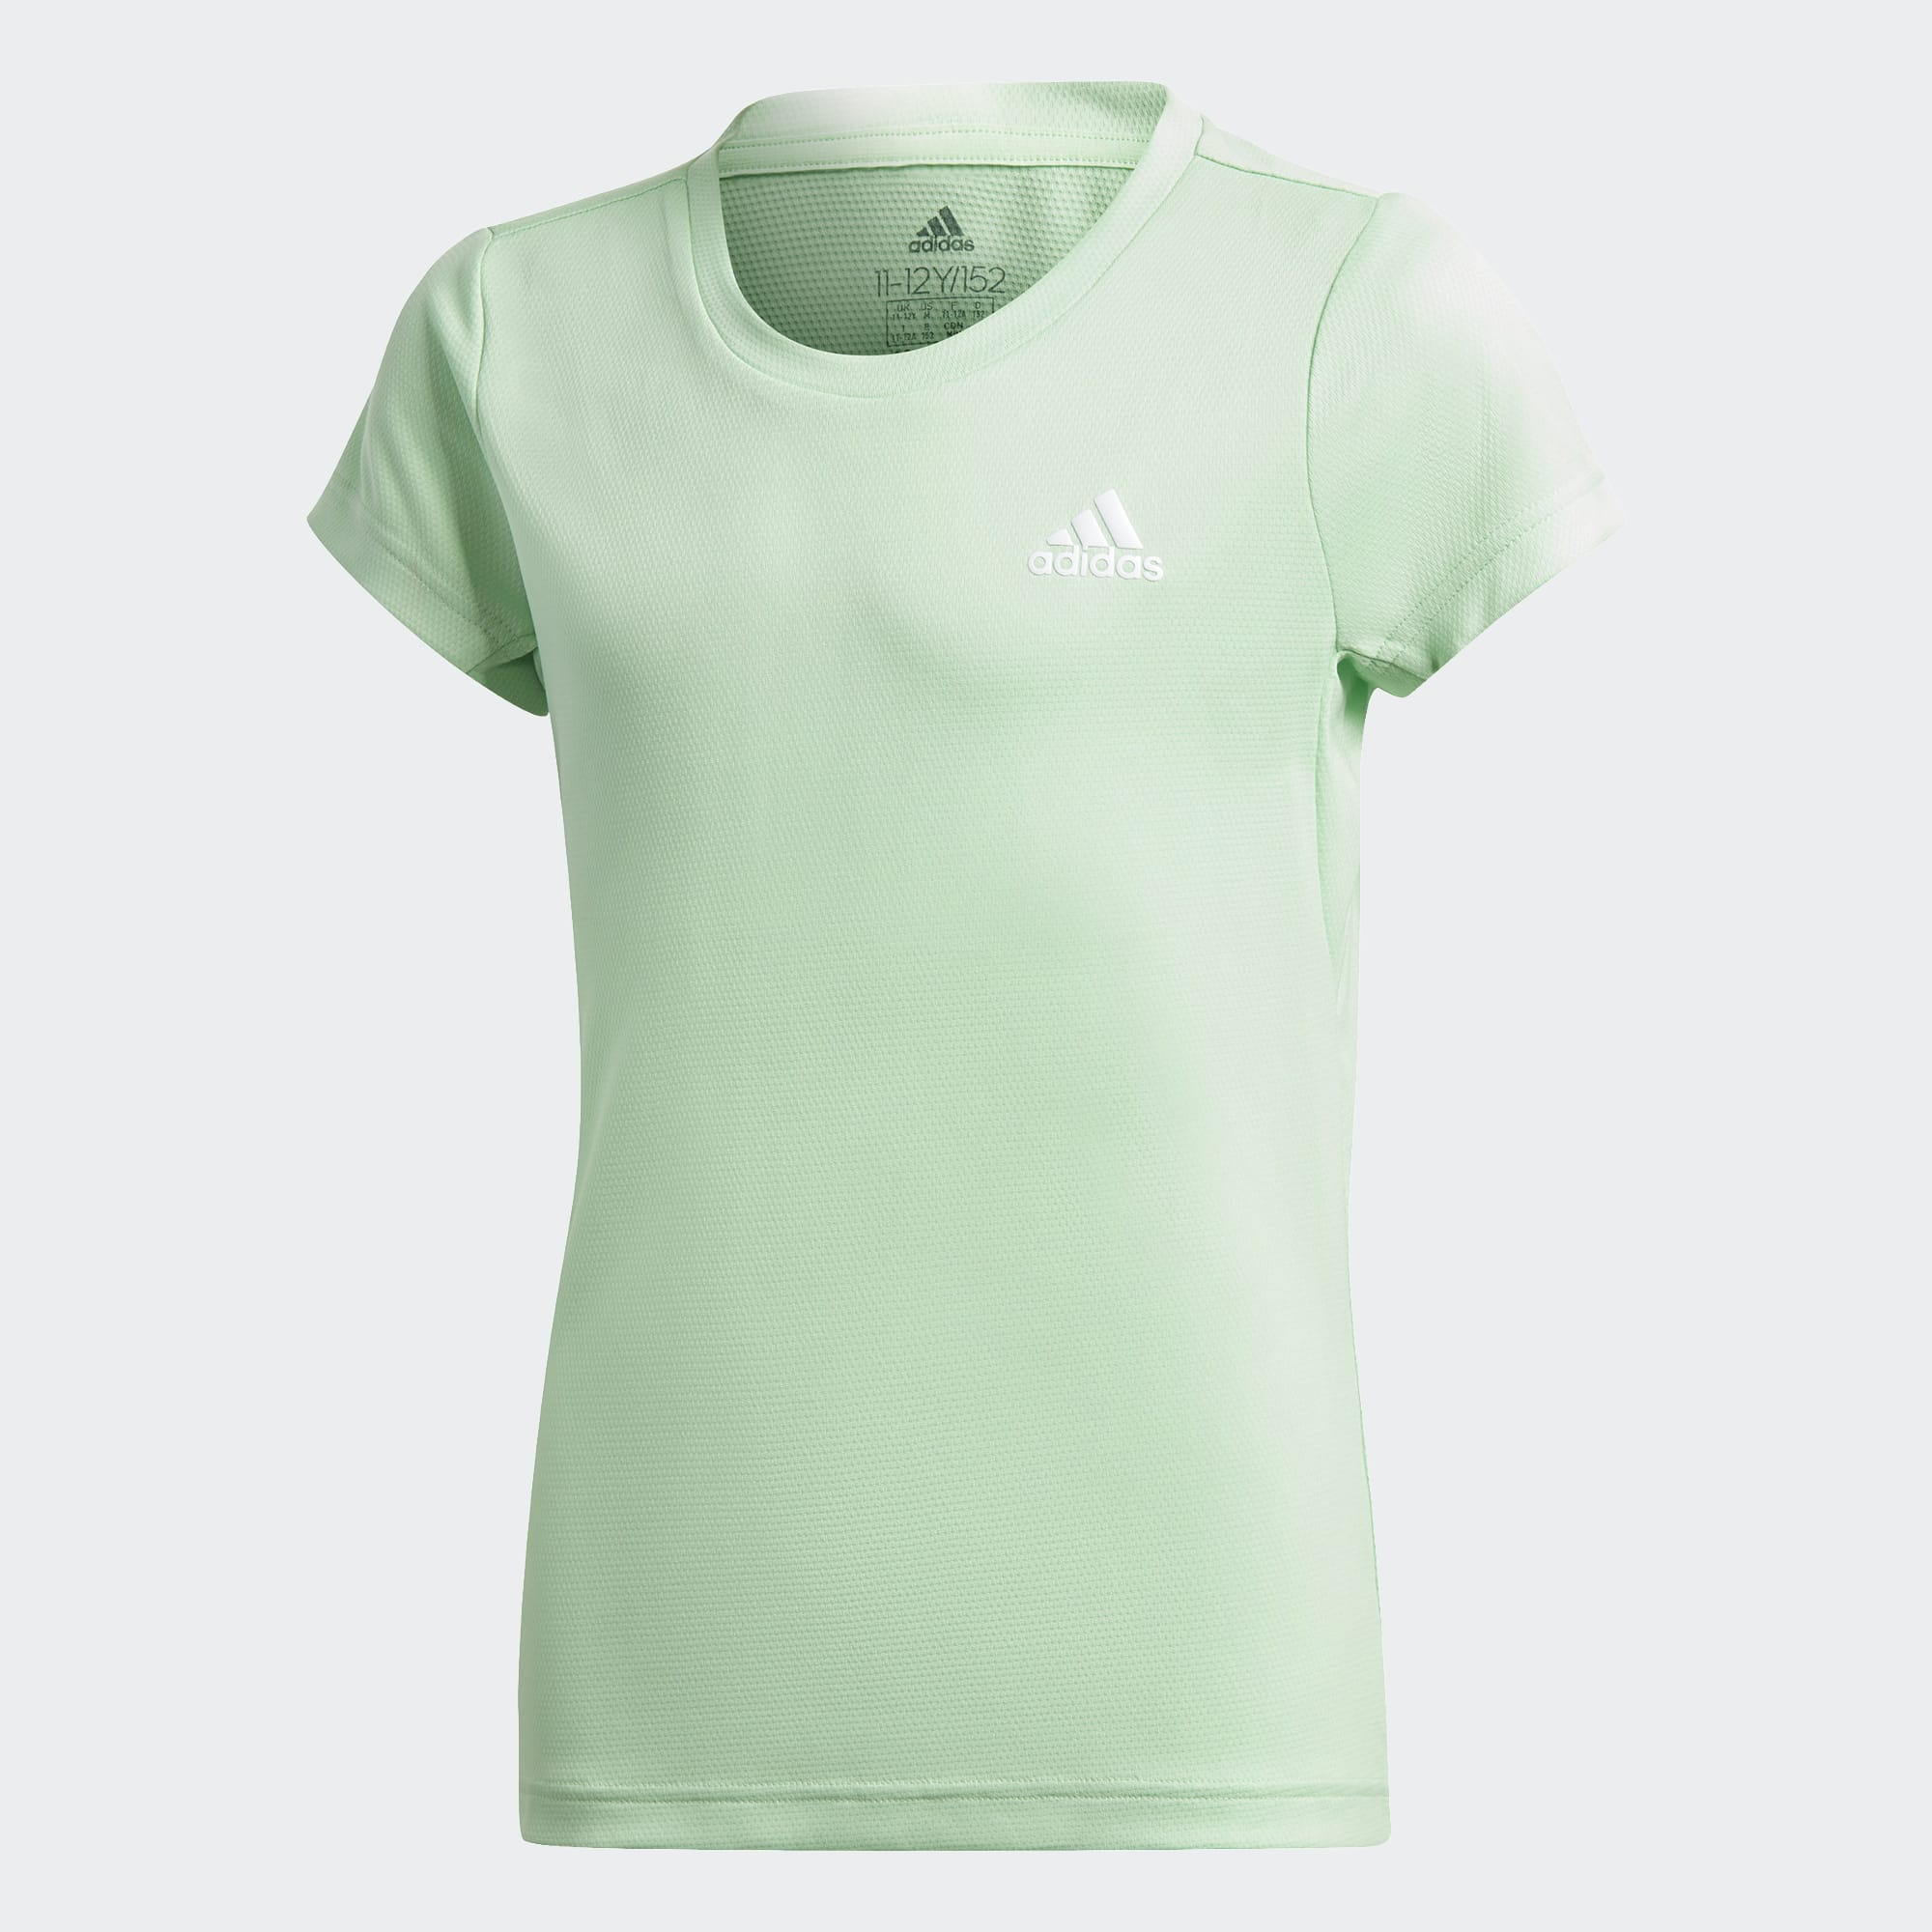 Adidas Mädchen Trainings T-Shirt AERO